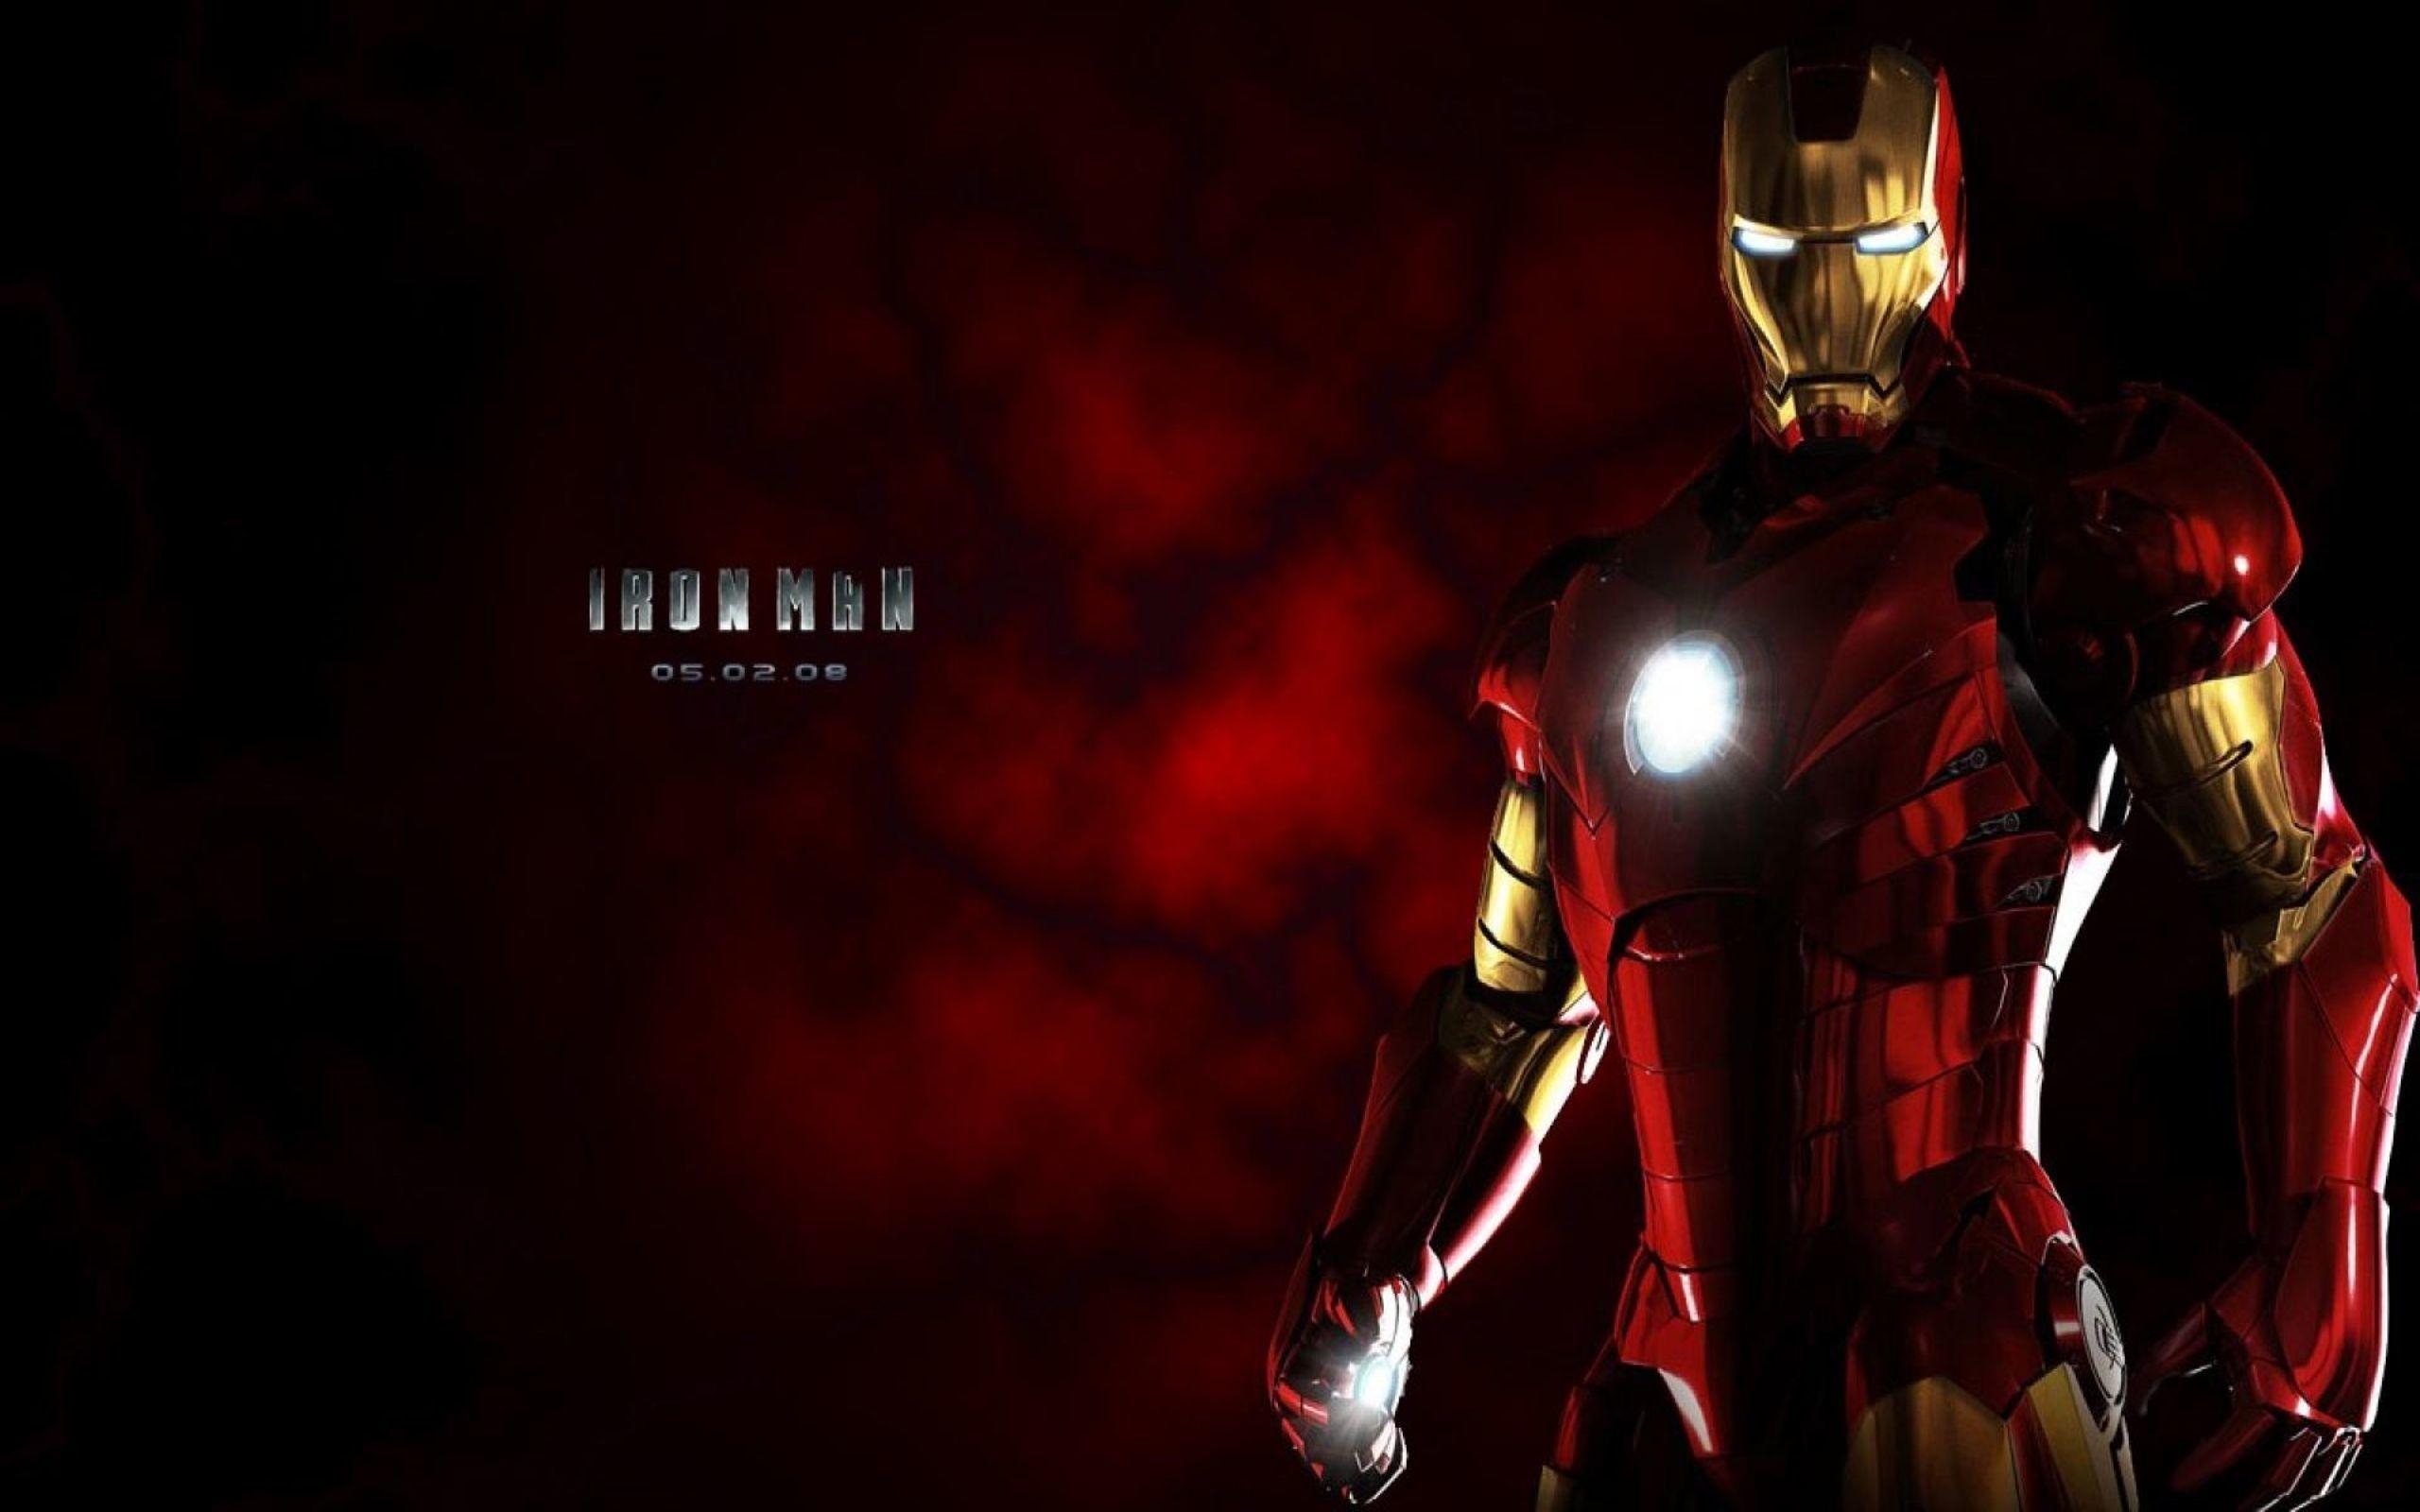 Iron Men Wallpapers wallpapers 2020 Iron man wallpaper